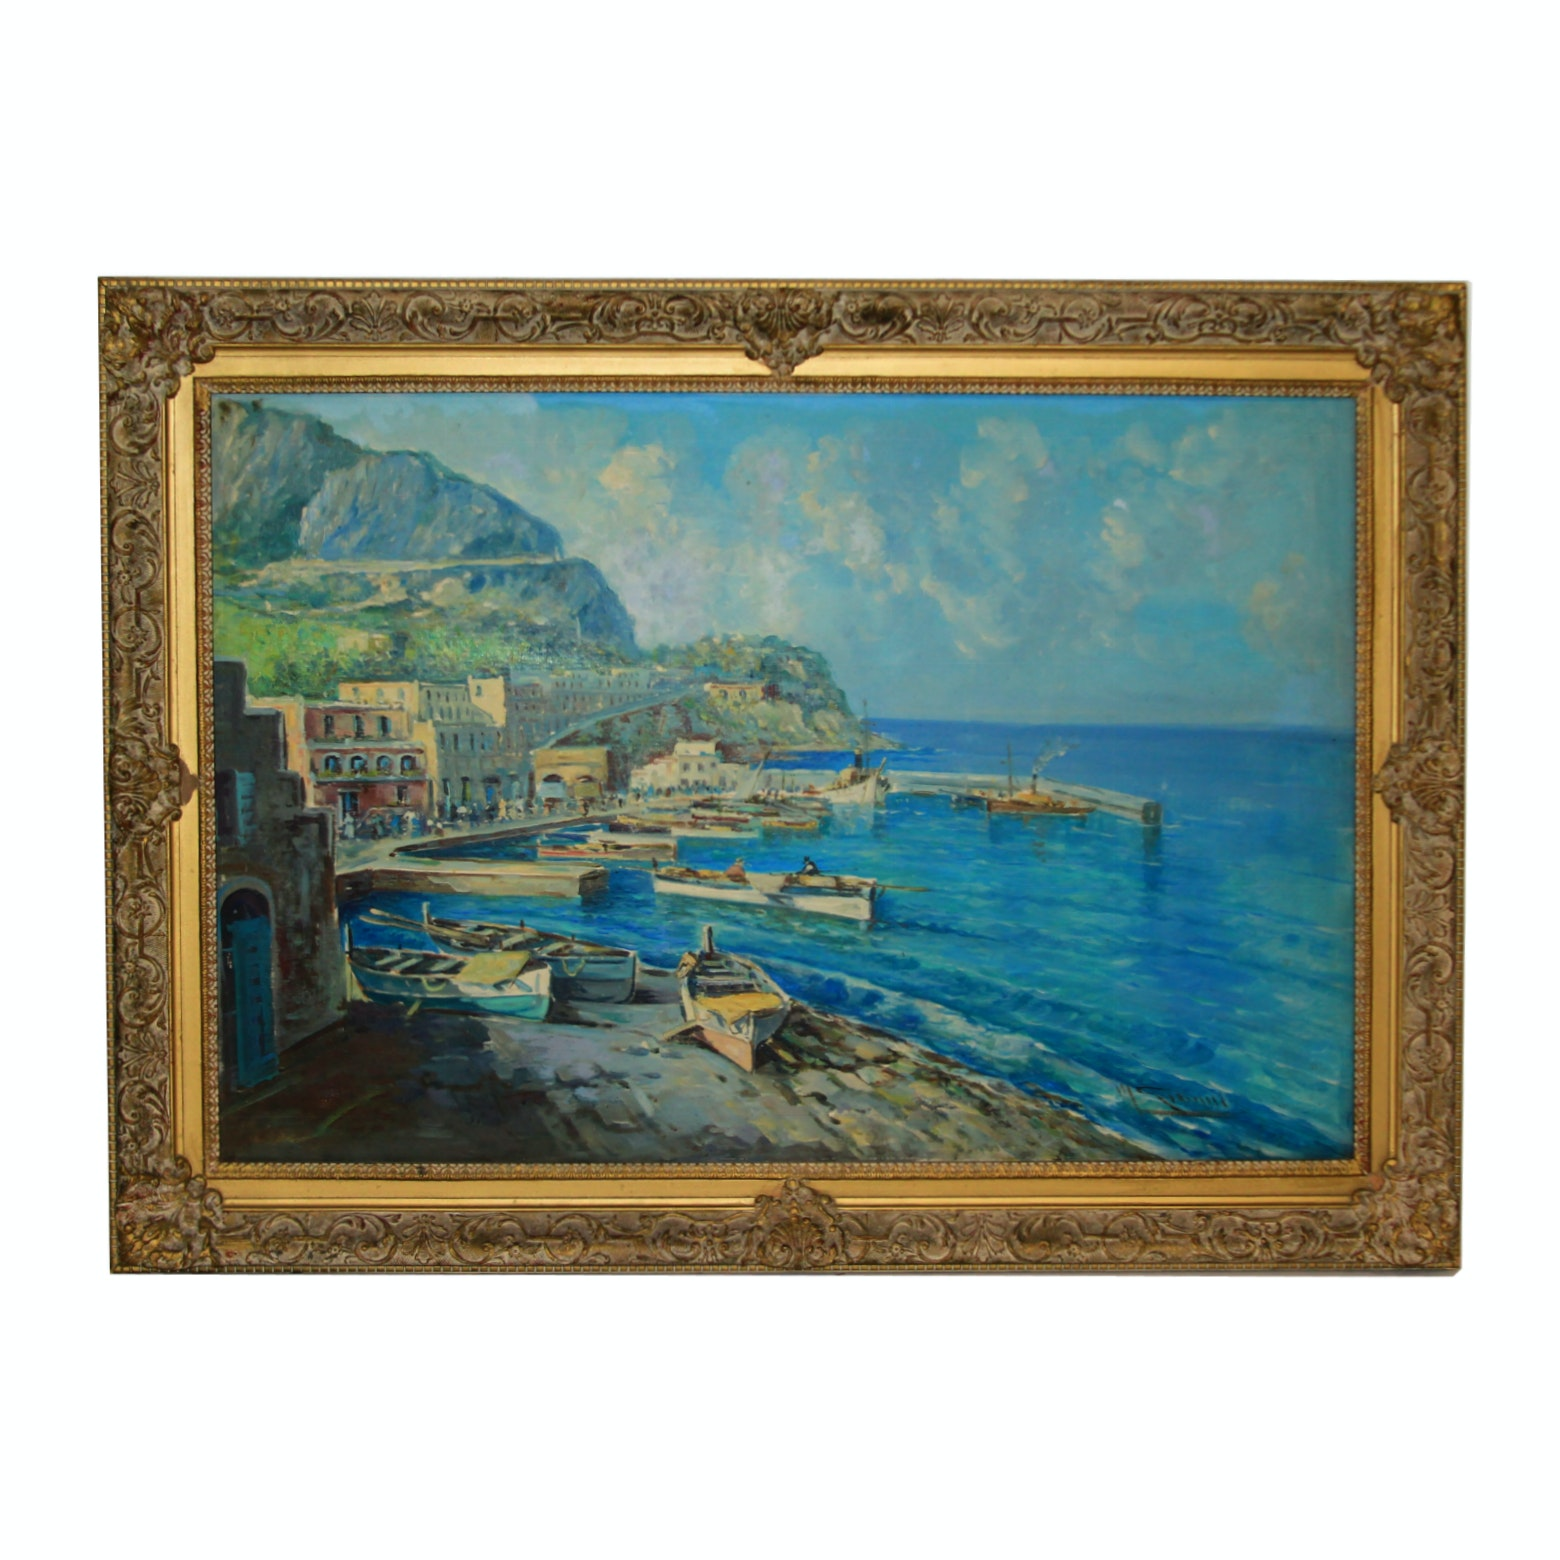 Oil Painting of an Oceanfront Scene